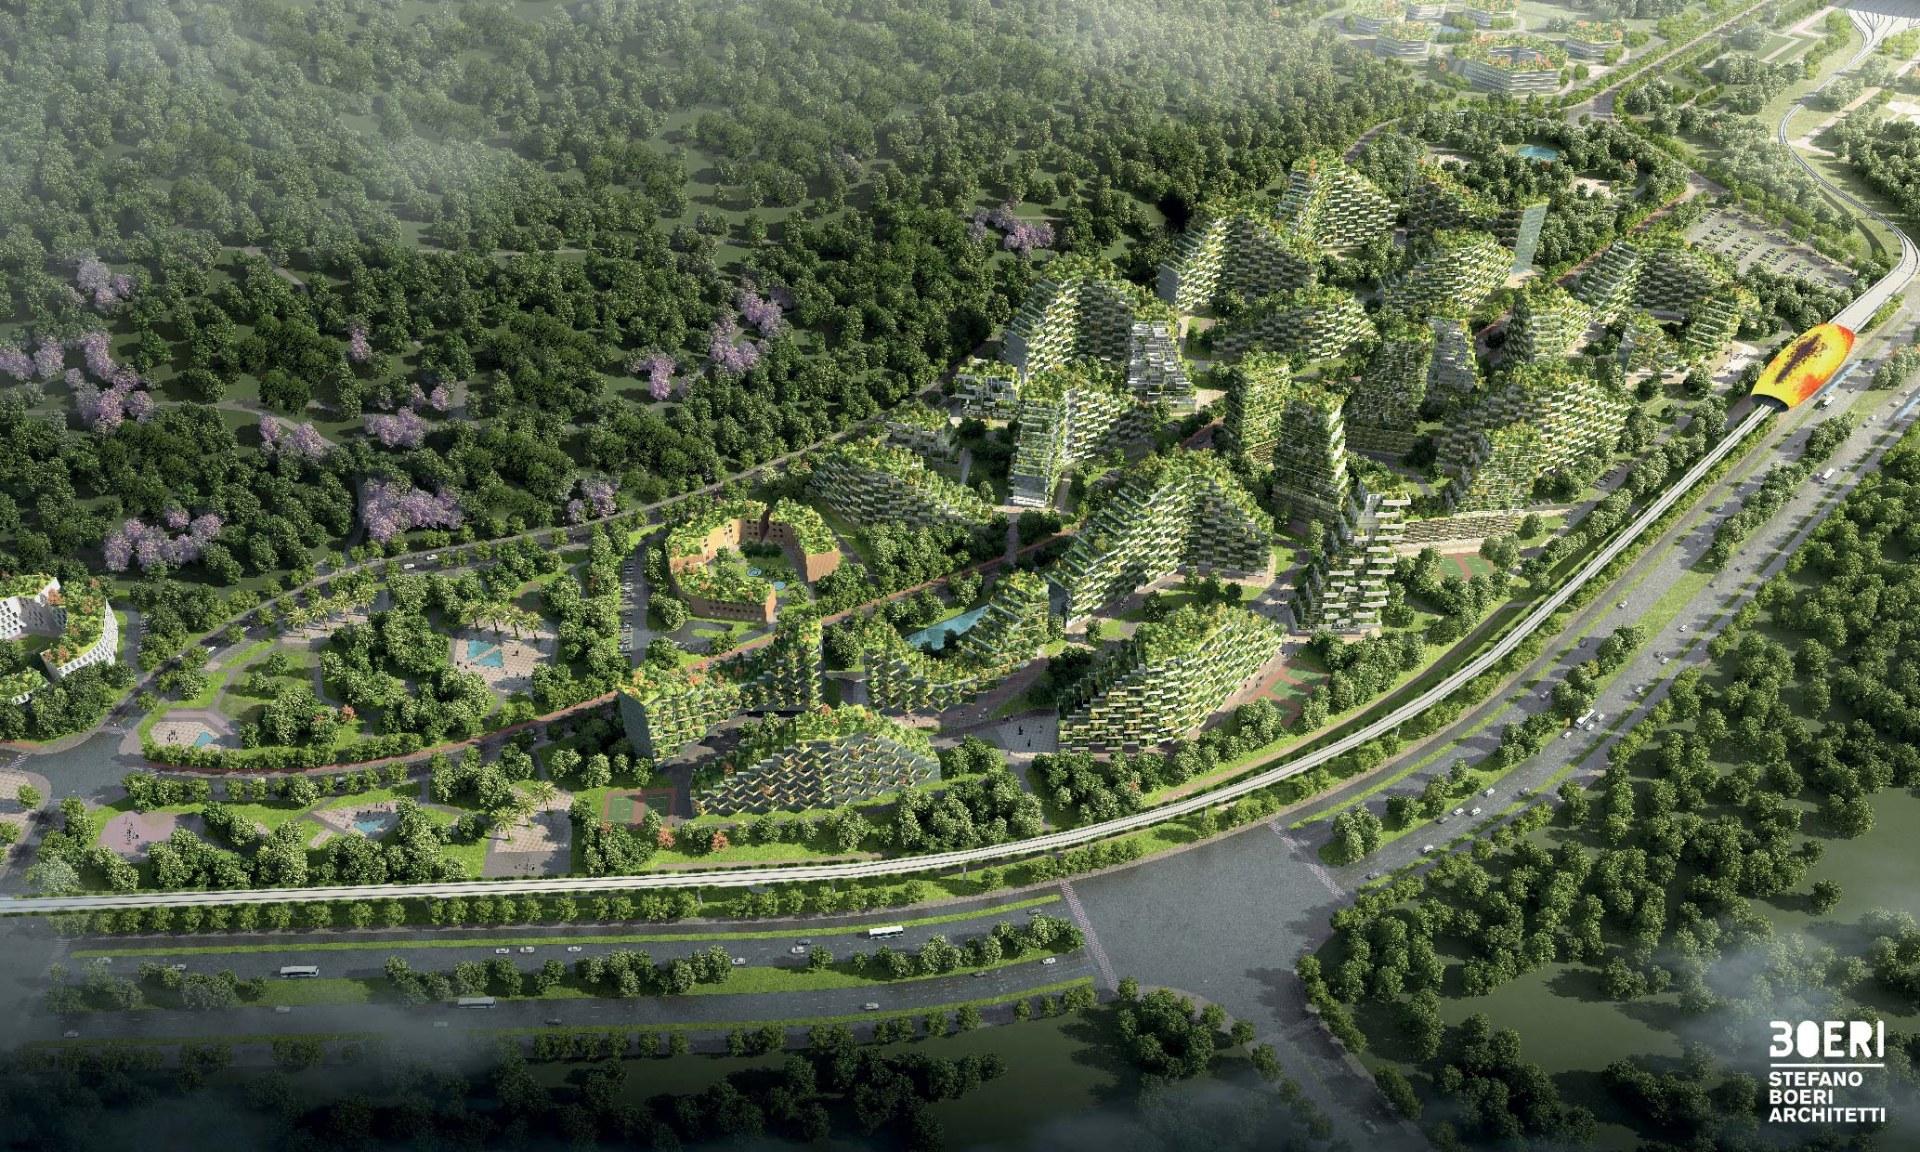 Stefano-Boeri-Architetti_Liuzhou-Forest-city_view-4